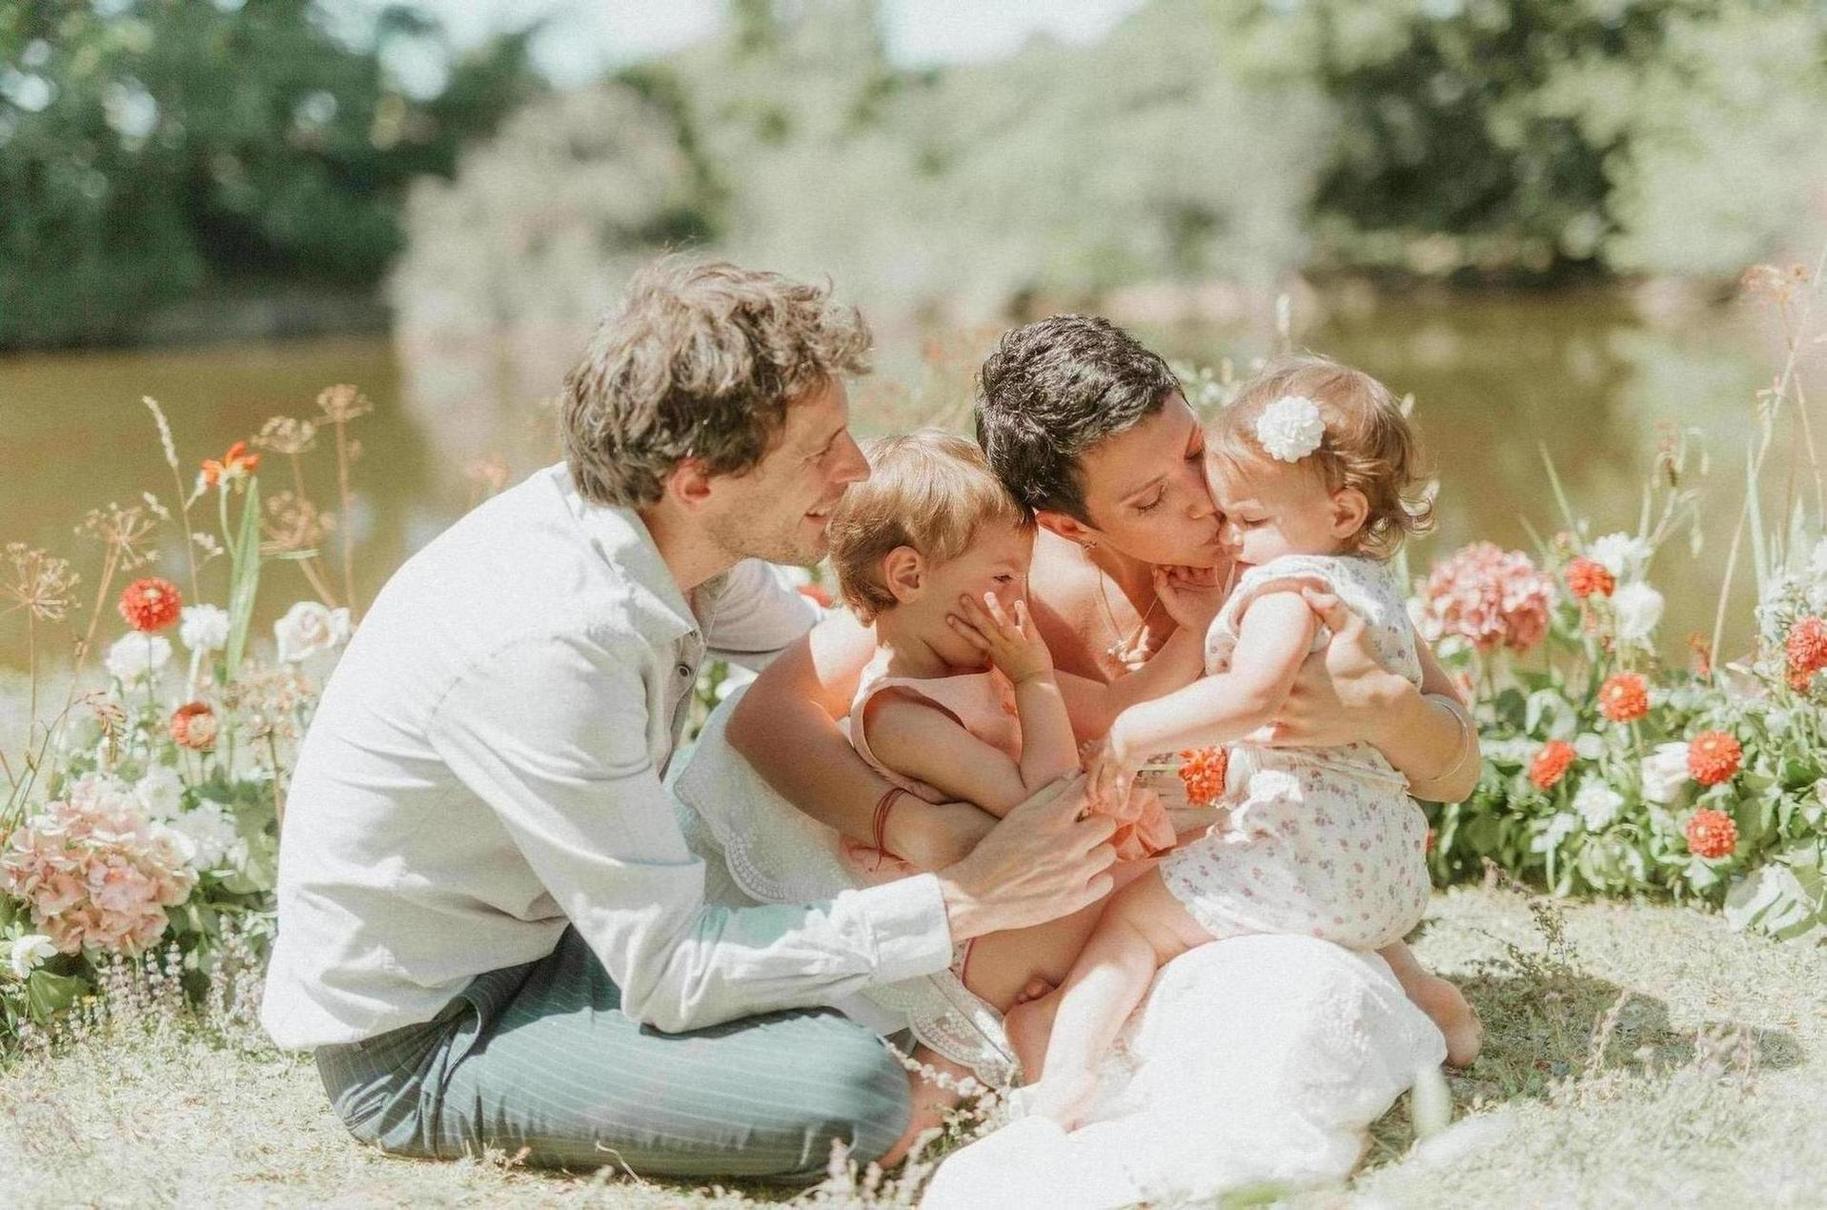 elopement mariage sans fete invite nantes angers chateaubriand